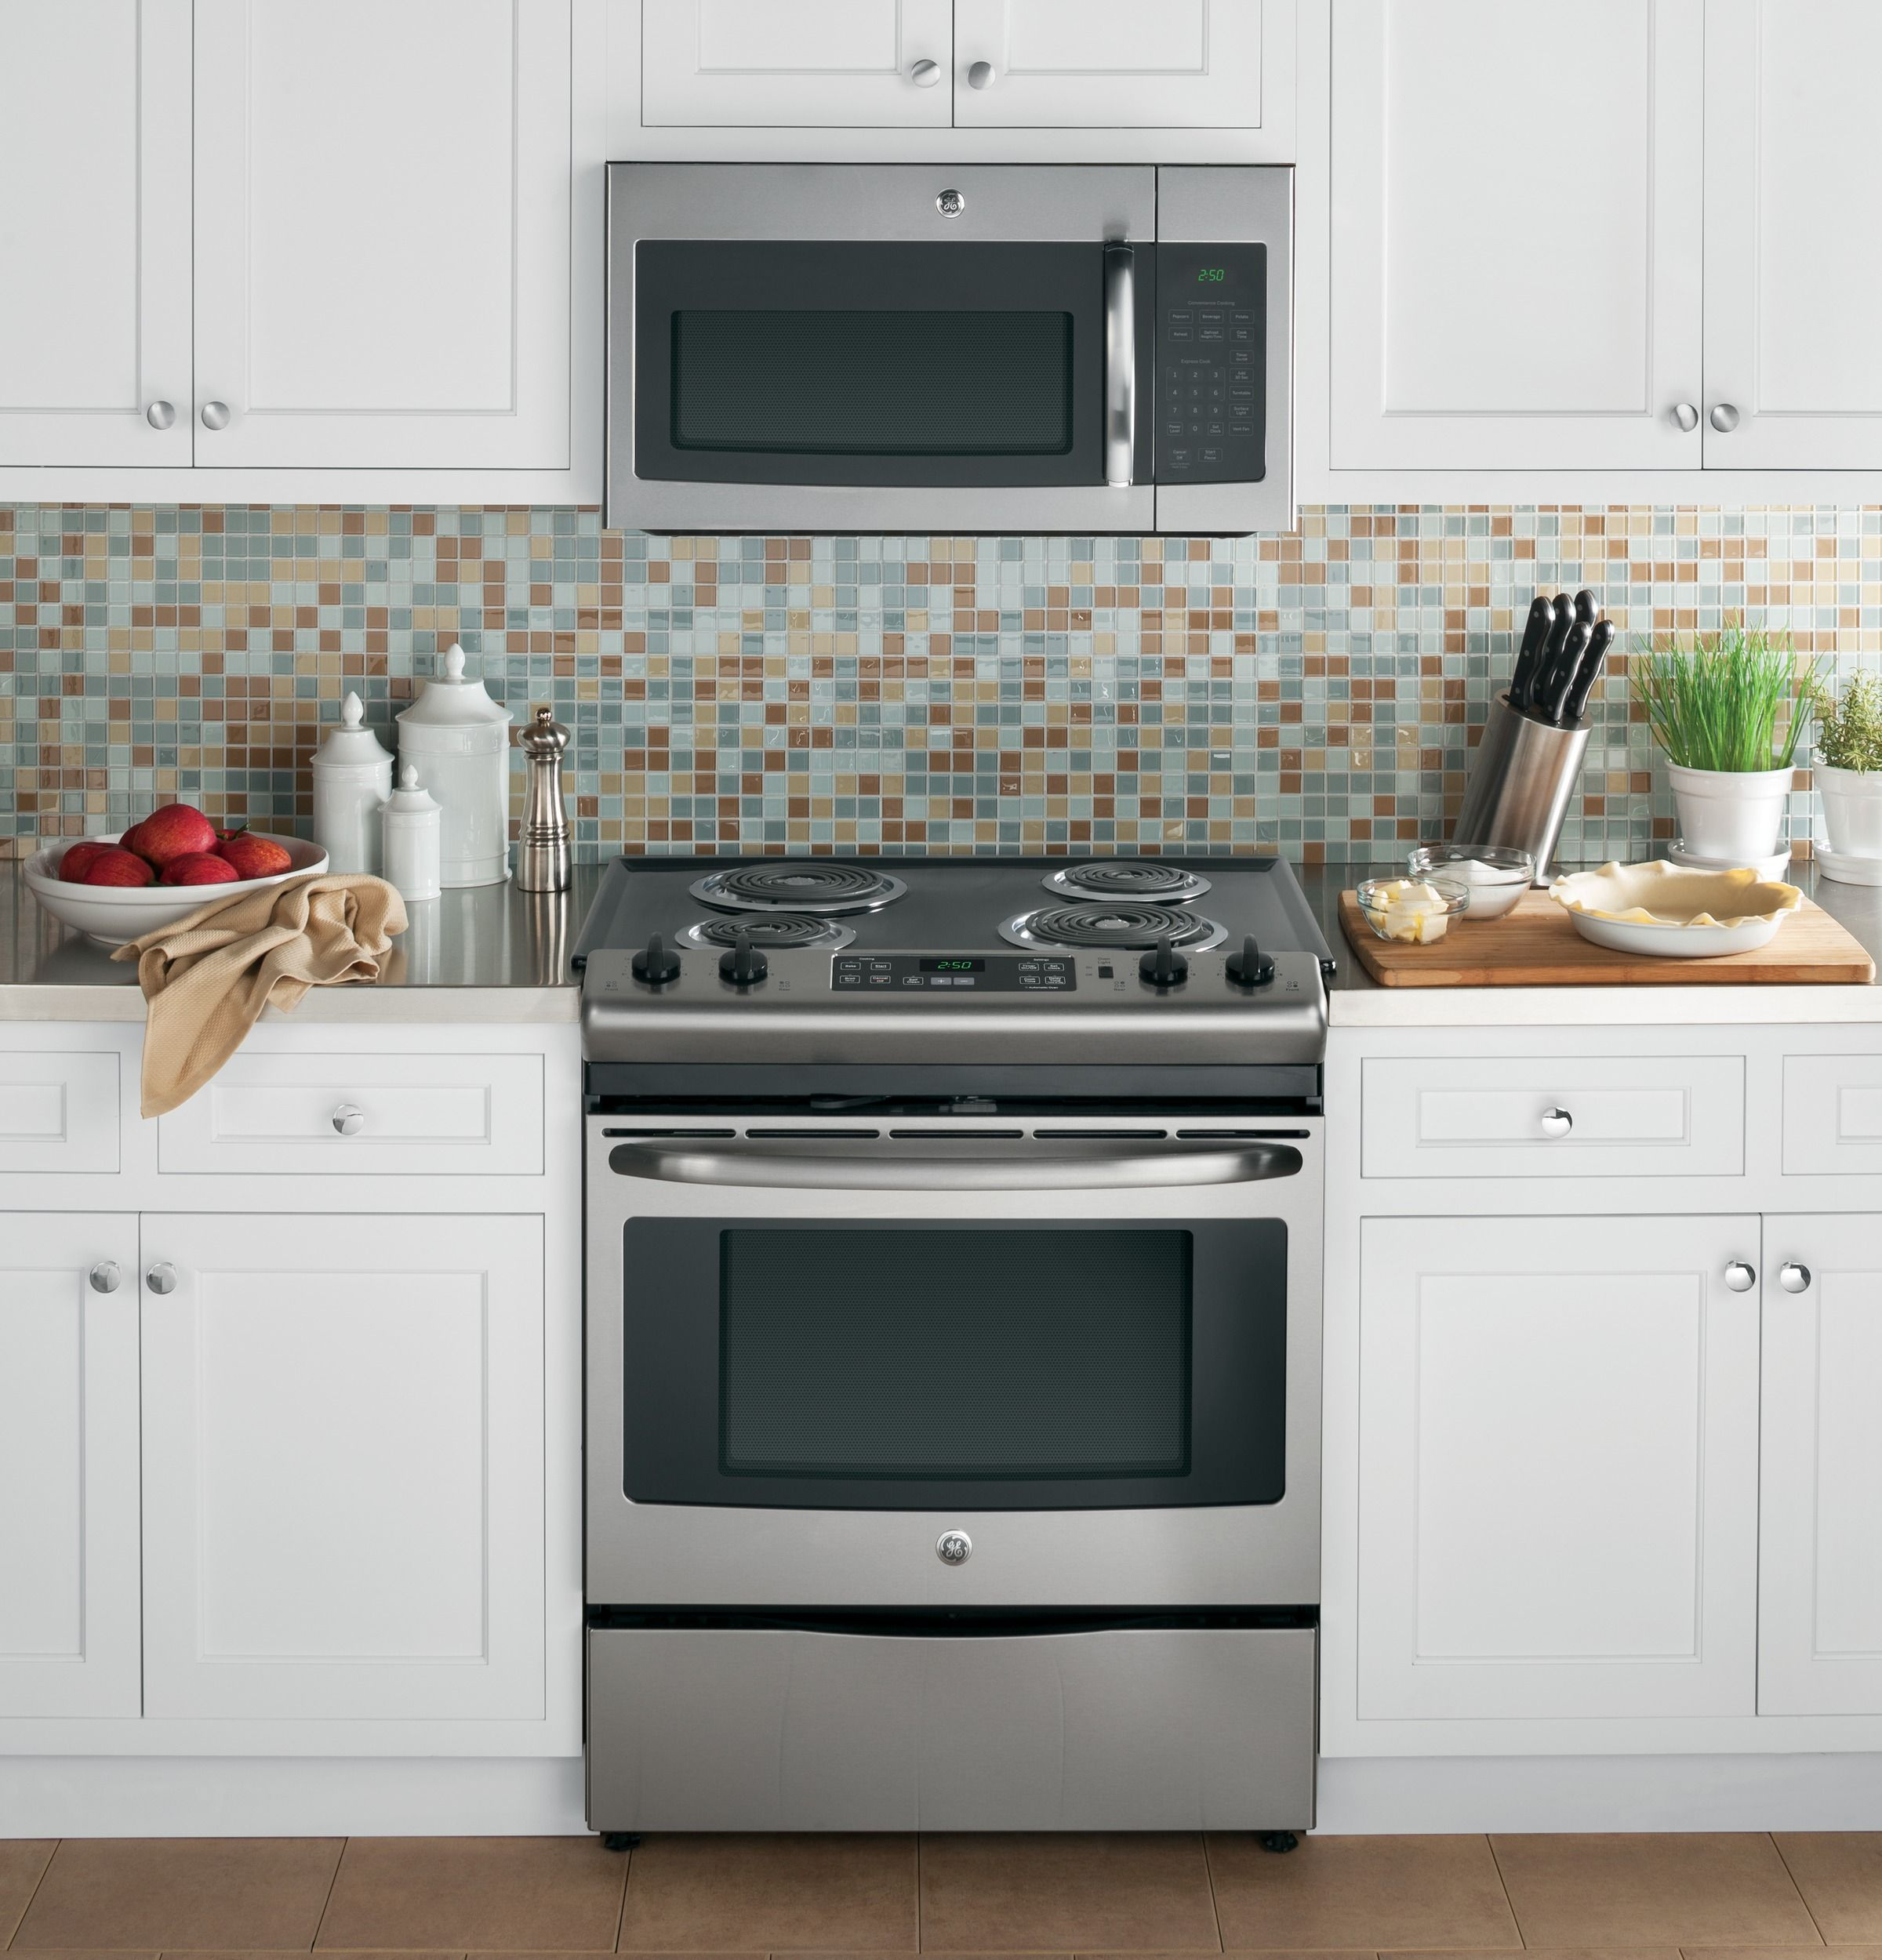 range microwave oven jvm3160rfss